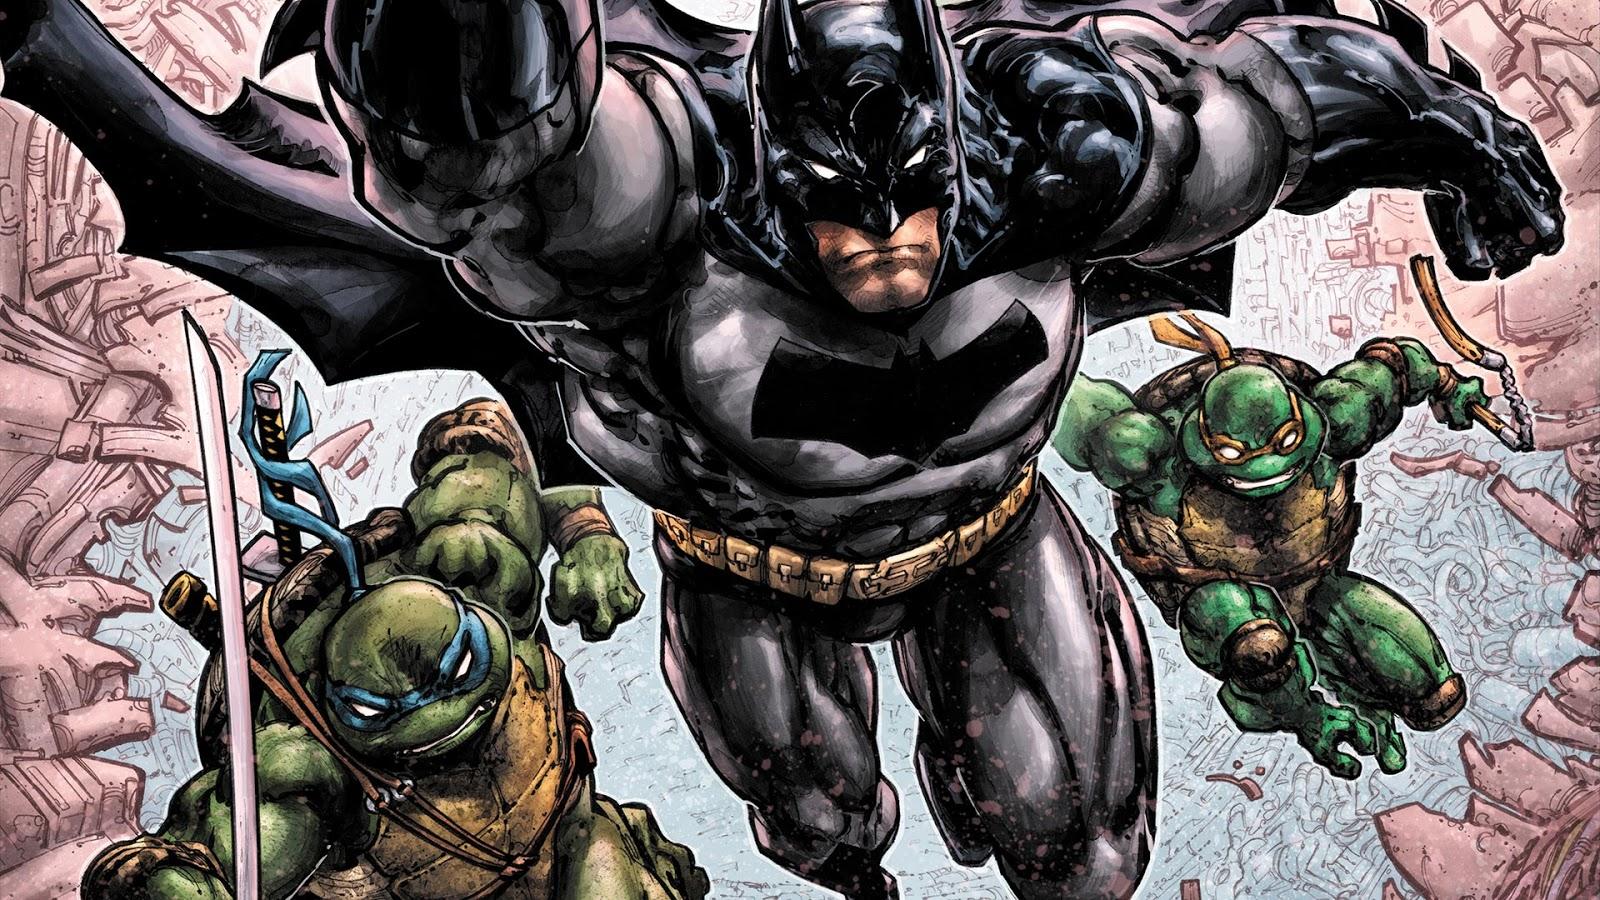 Nickalive Dc Idw And Nickelodeon Announce Batman Teenage Mutant Ninja Turtles Iii Comic Series Updated W Art